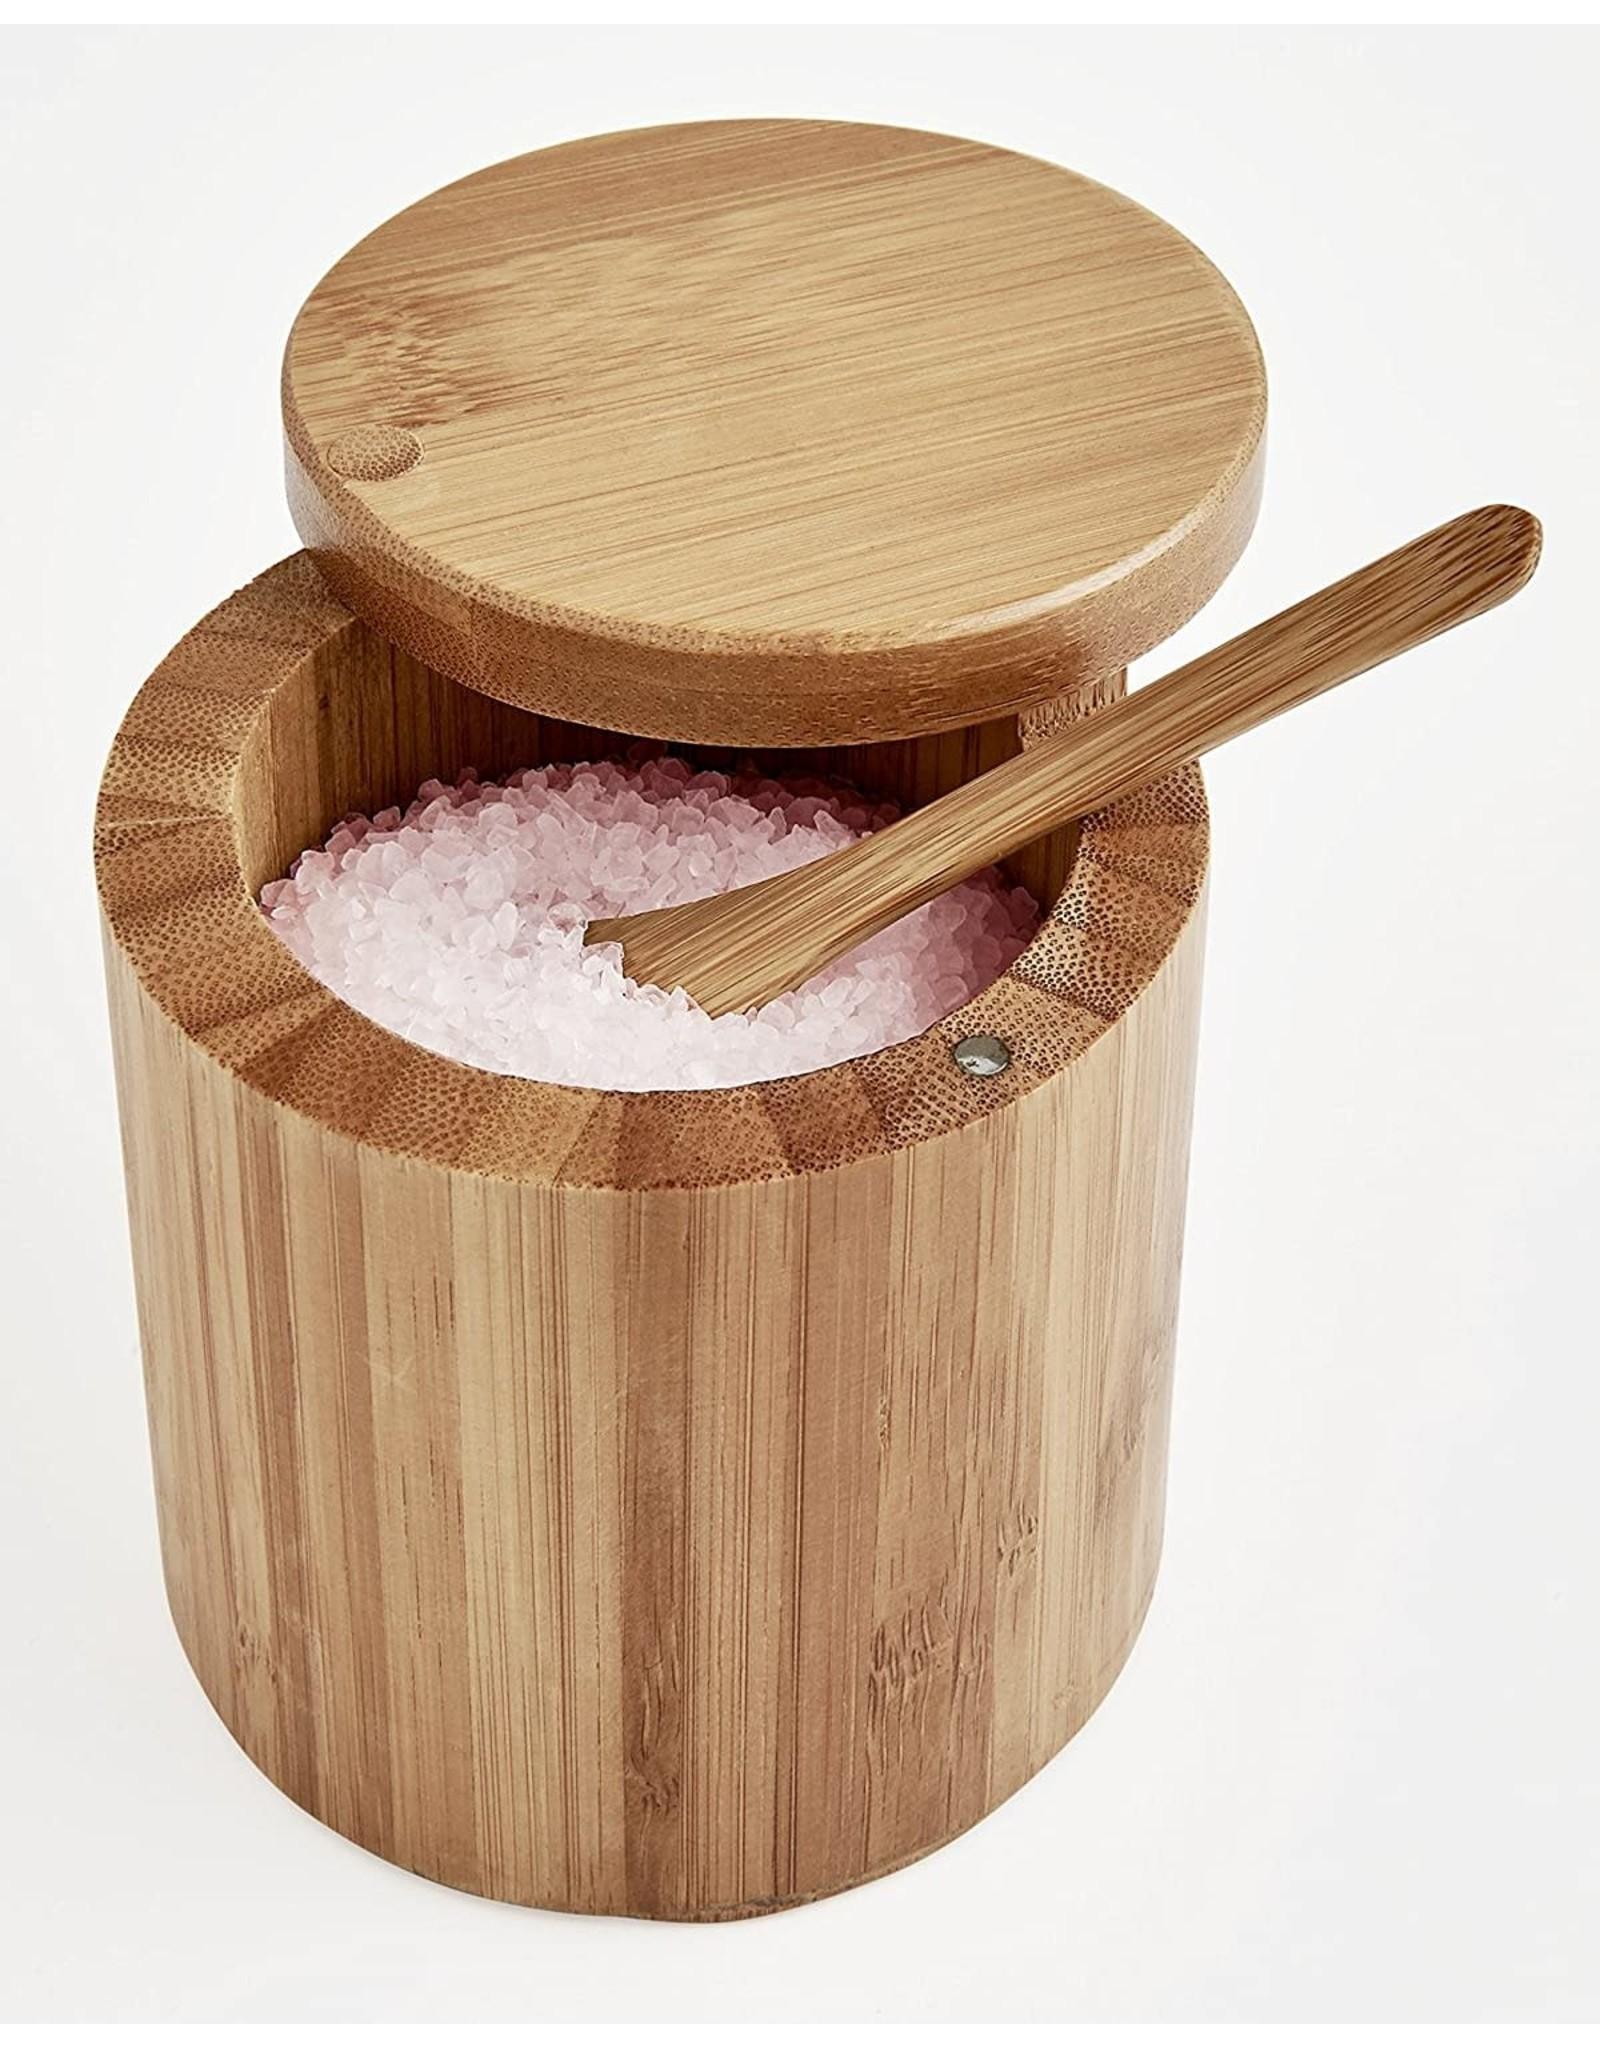 Bamboo Salt Box with Spoon